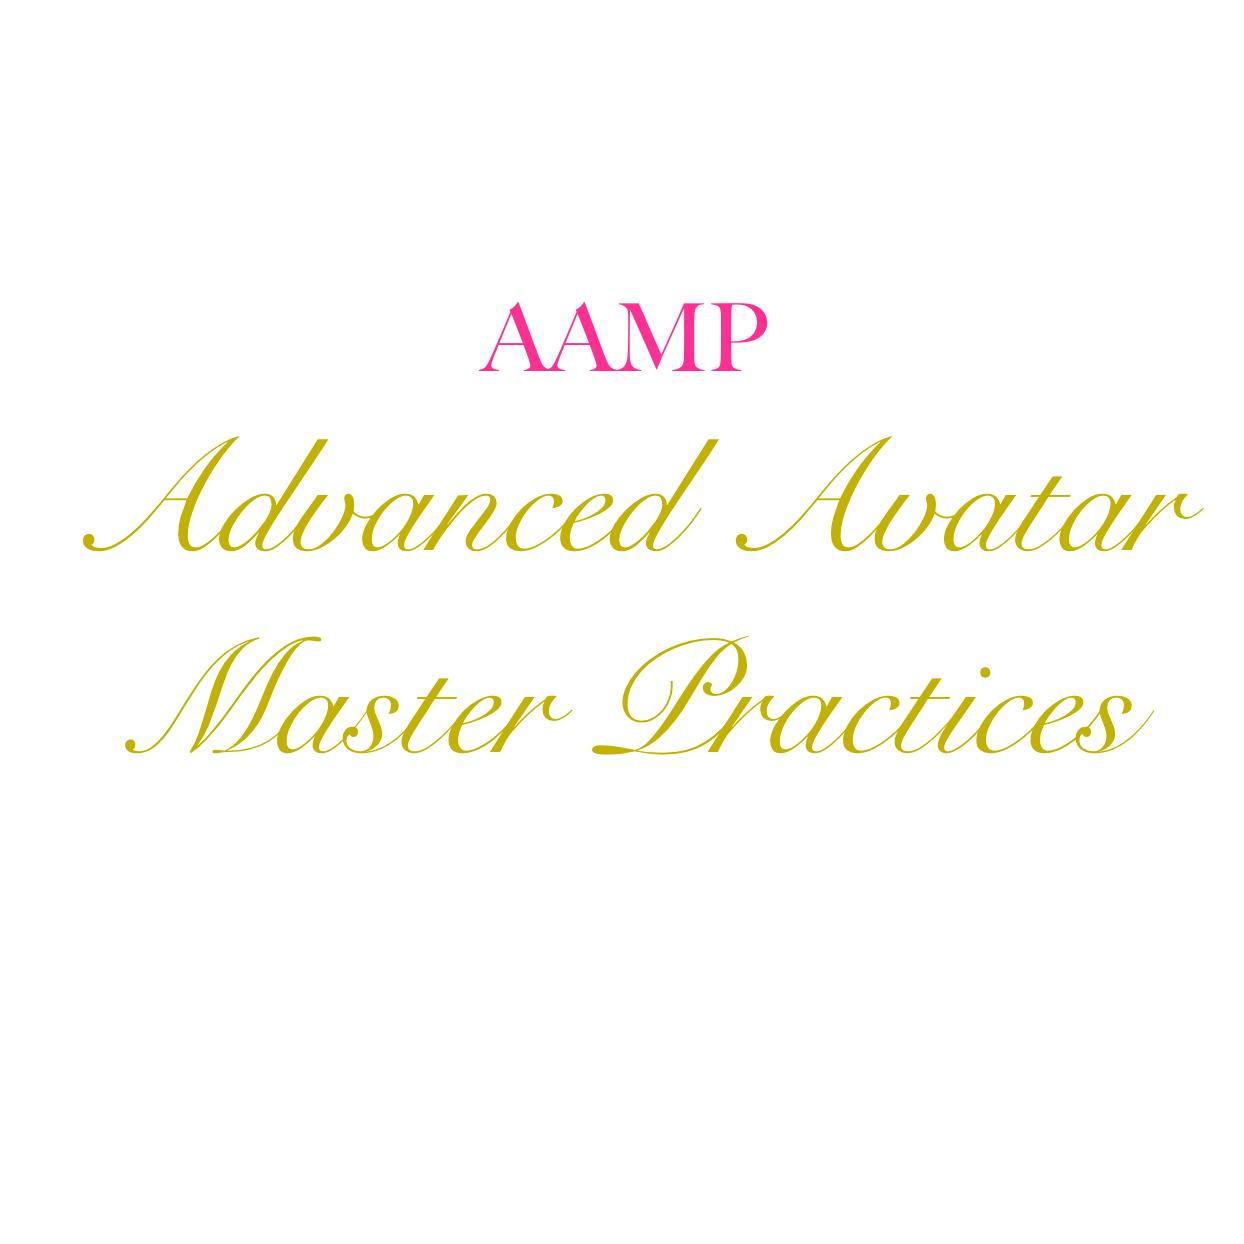 AAMP Advanced Avatar Master Practices